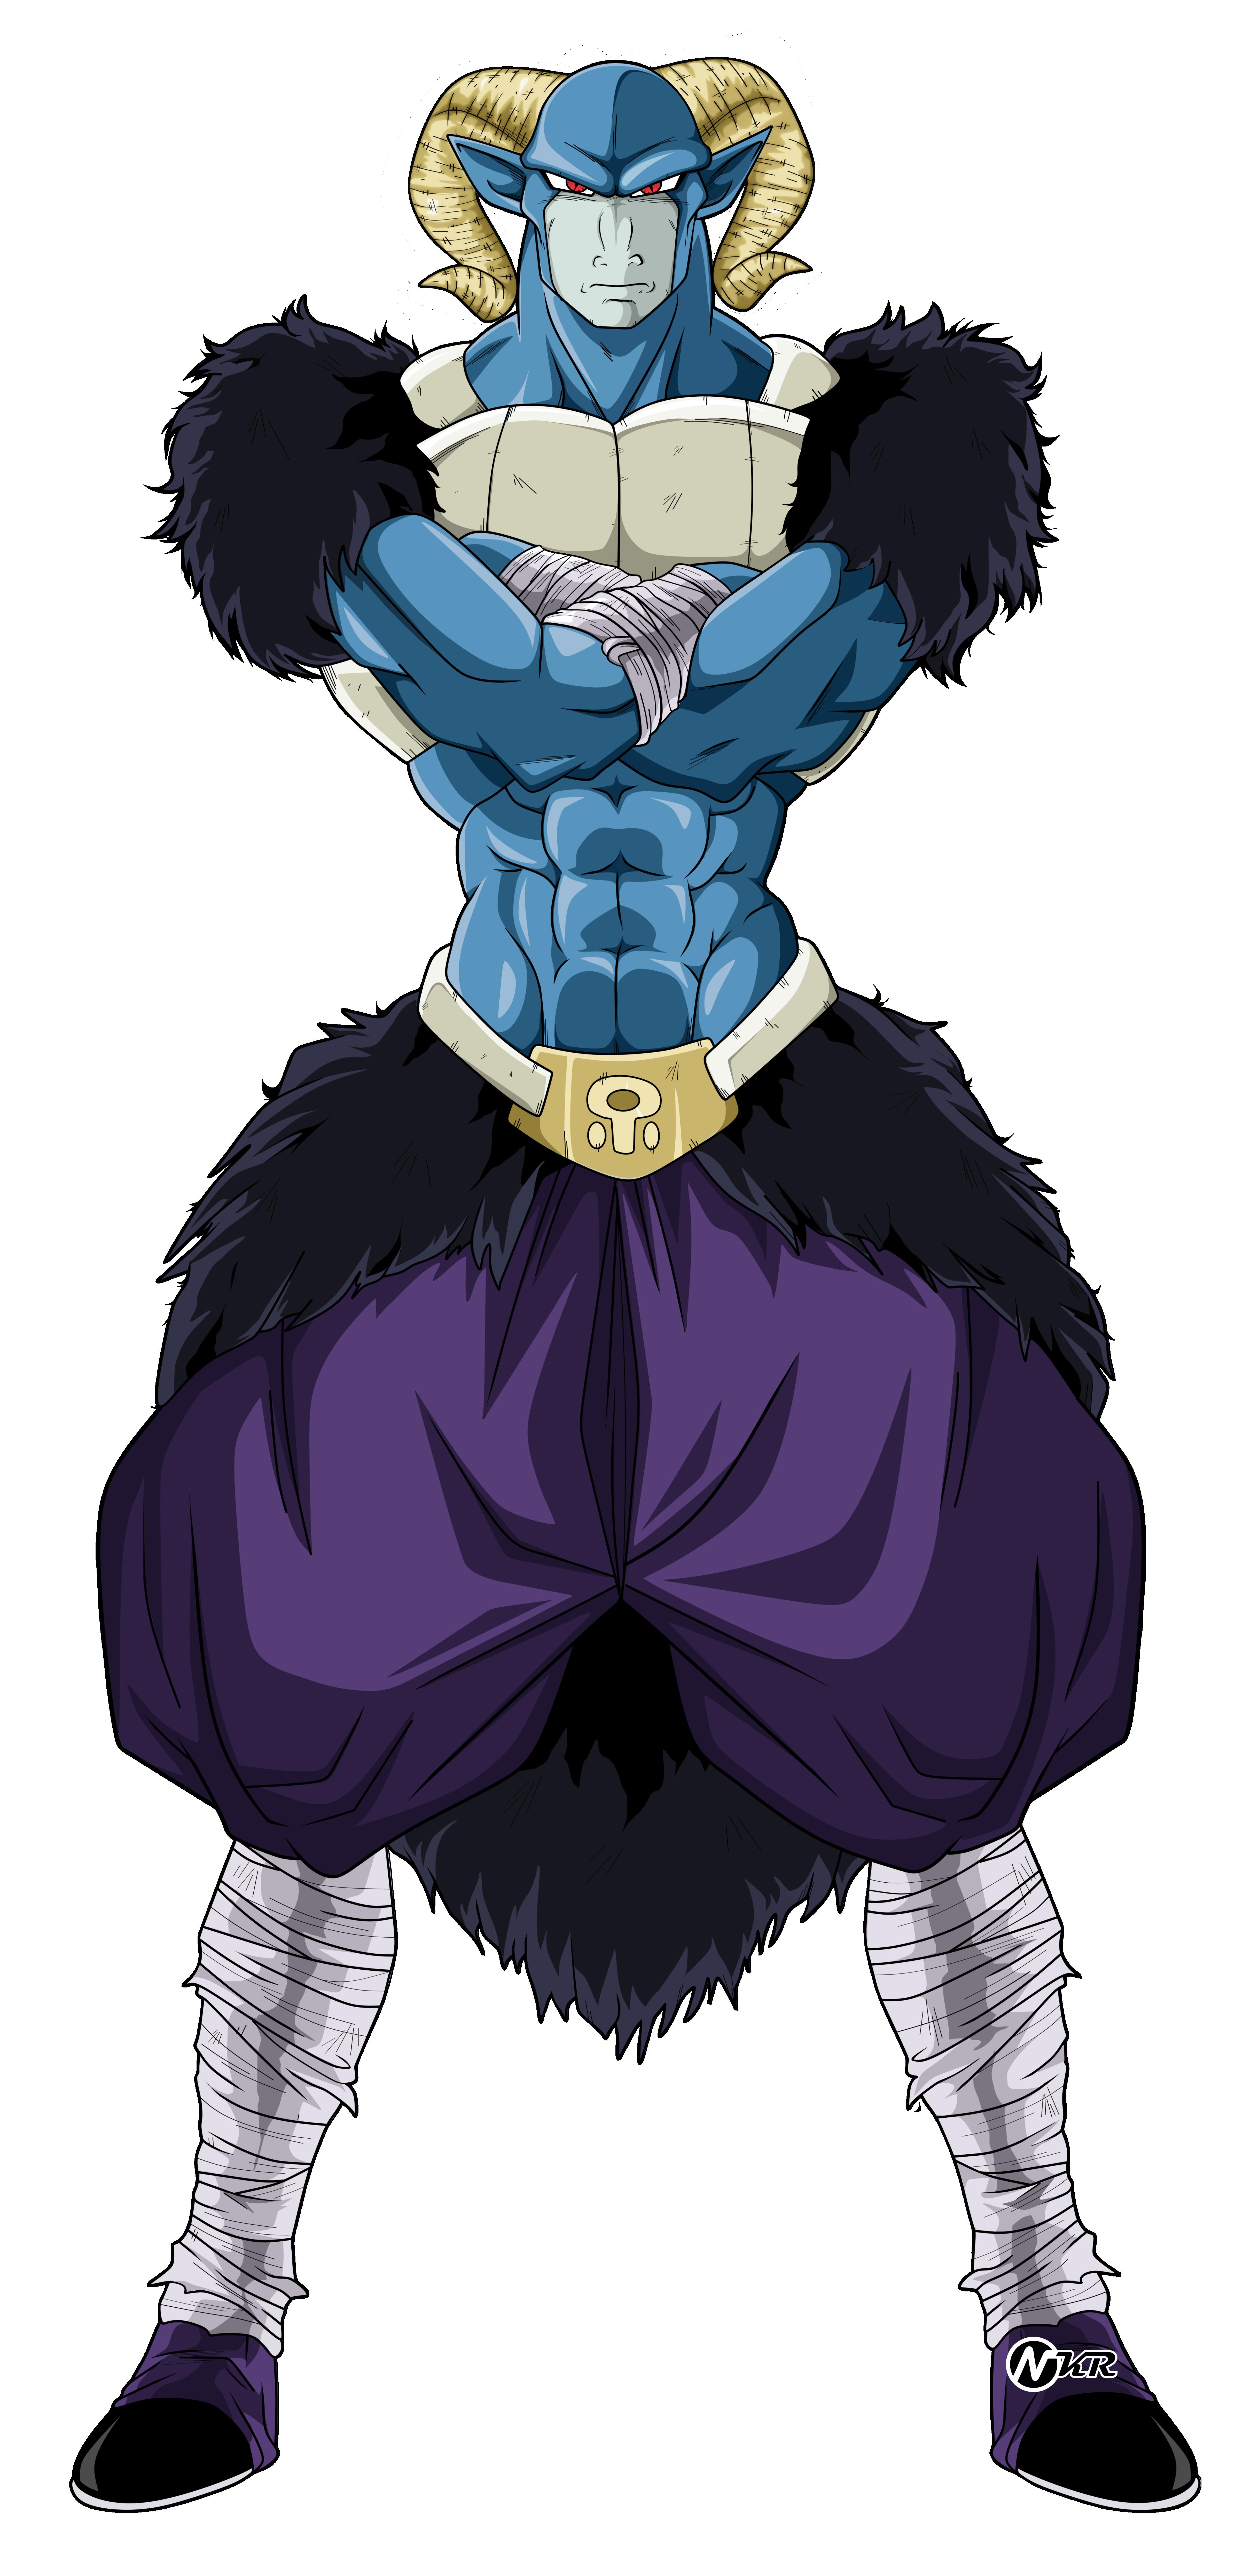 Dragon Ball Super Moro : dragon, super, Dragon, Super, Naironkr, DeviantArt, Manga,, Wallpapers,, Anime